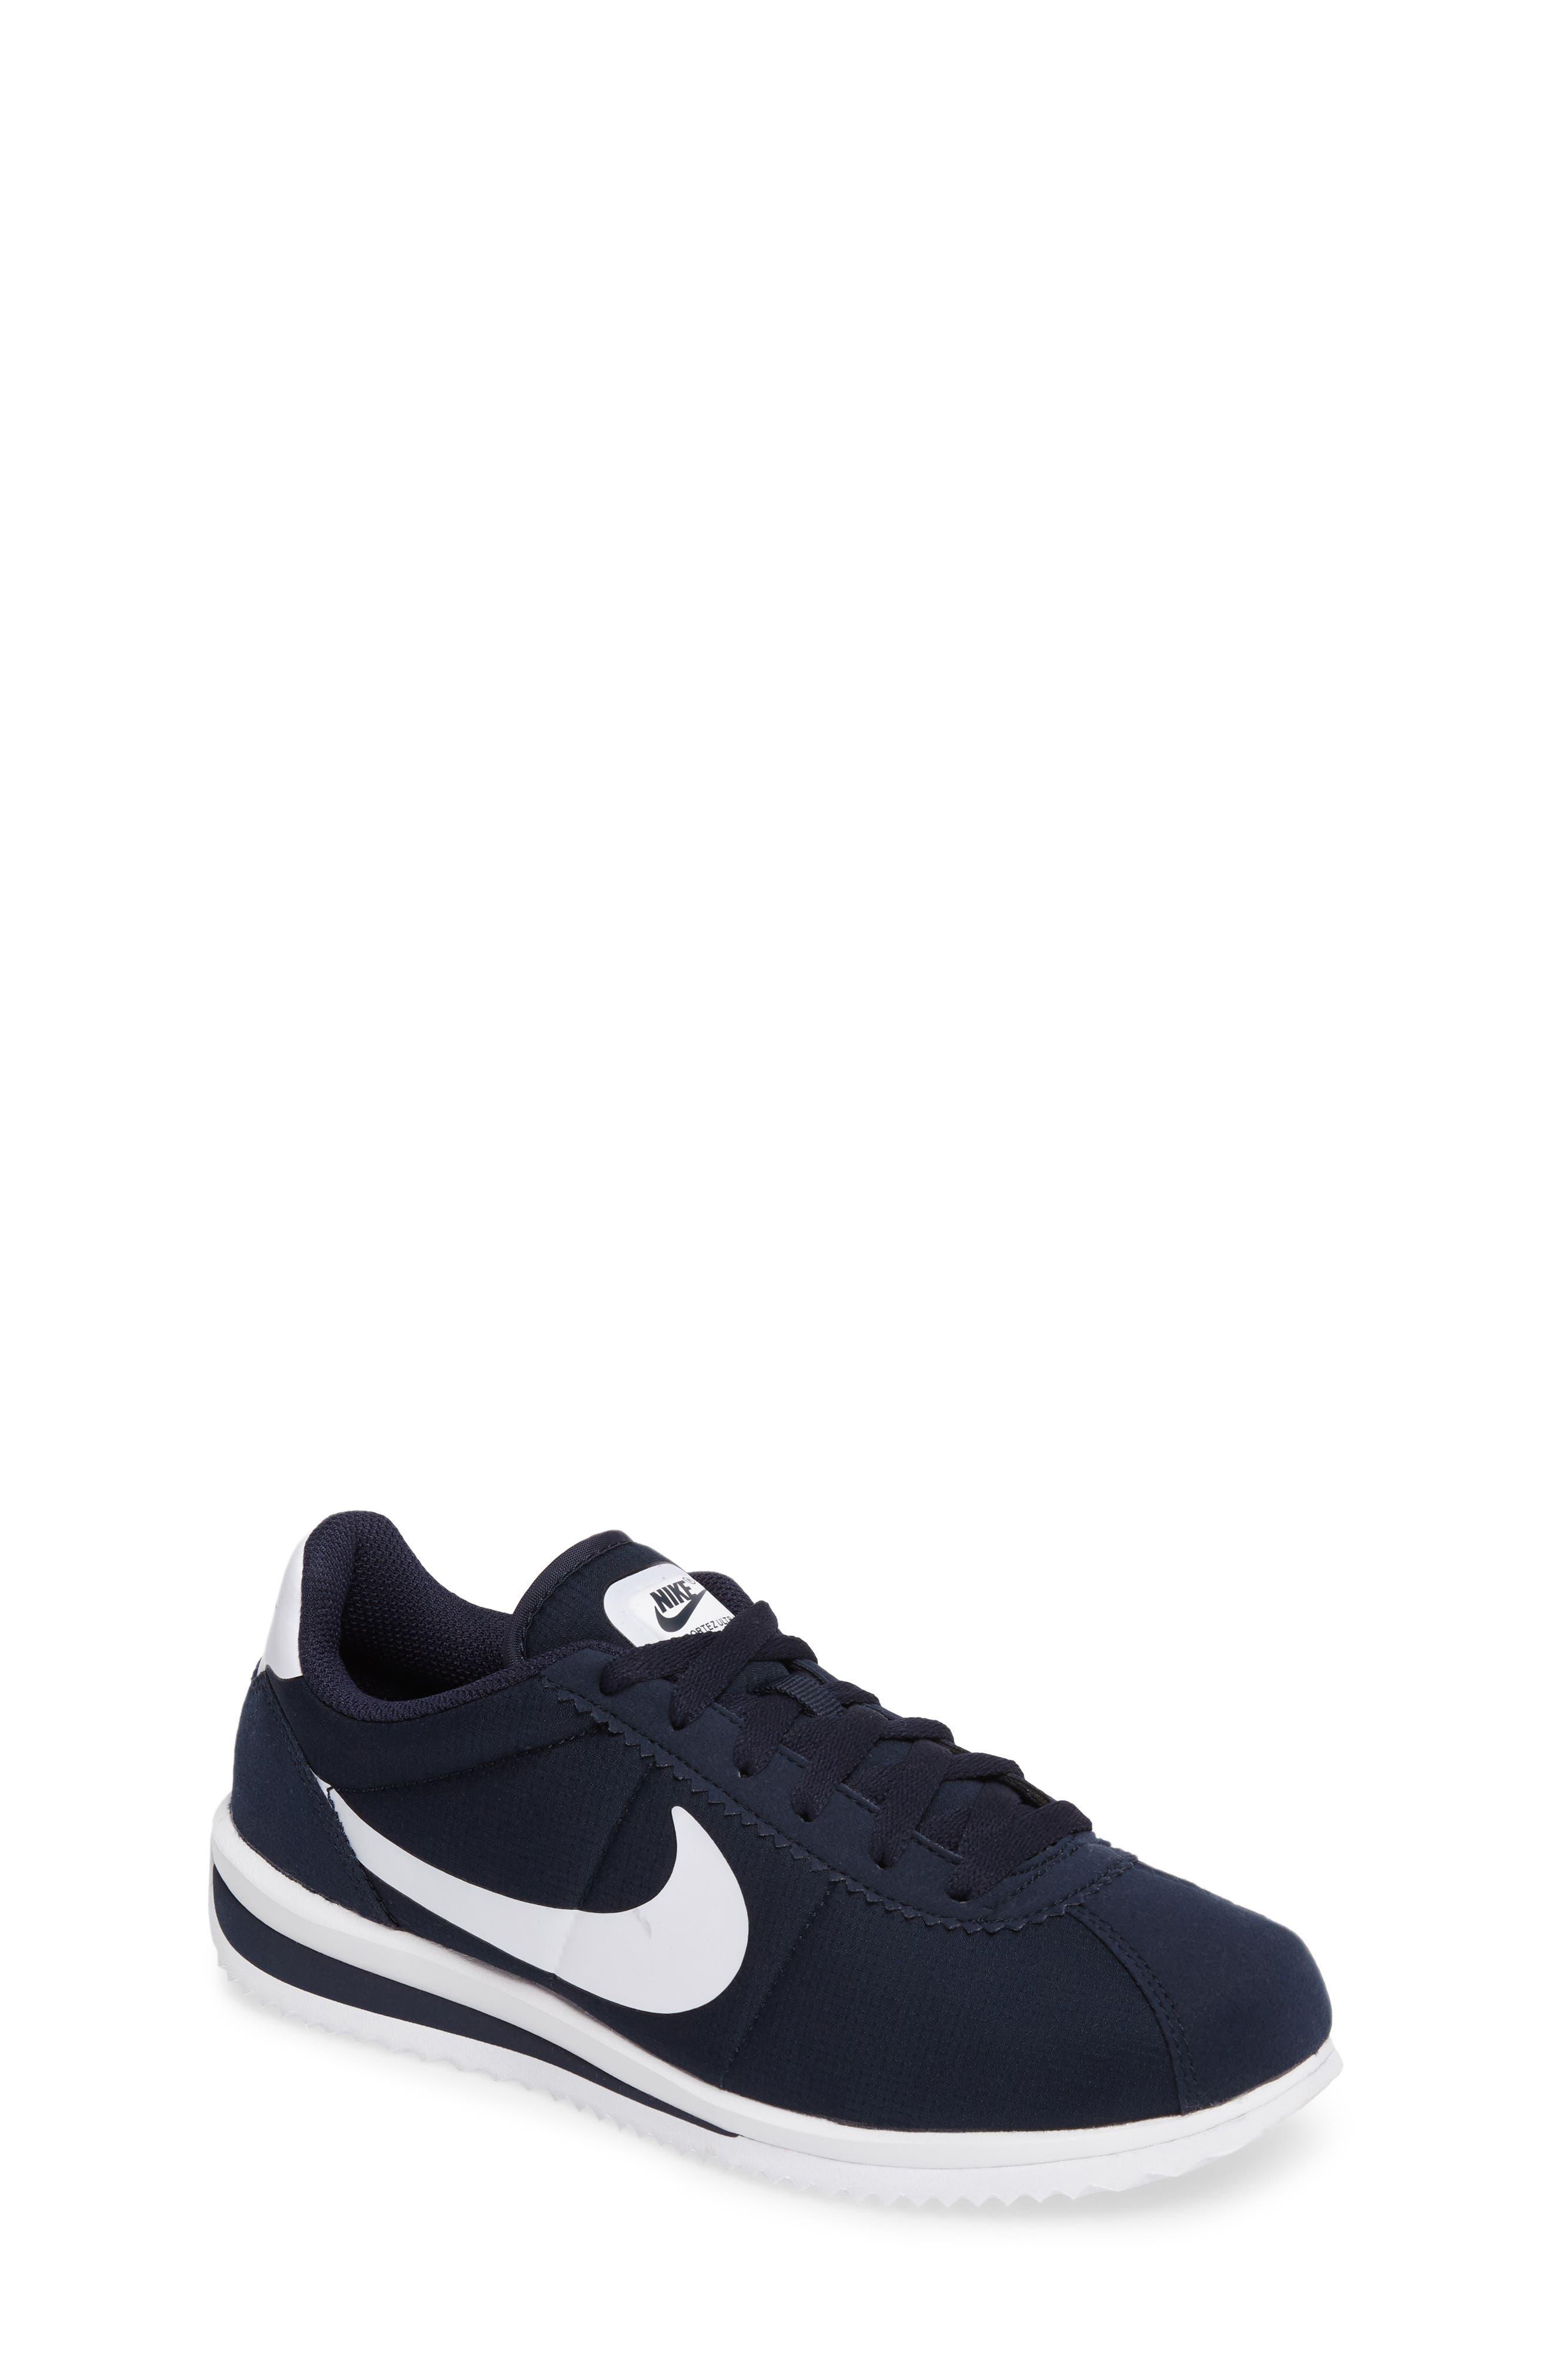 Cortez Sneaker,                         Main,                         color, 002